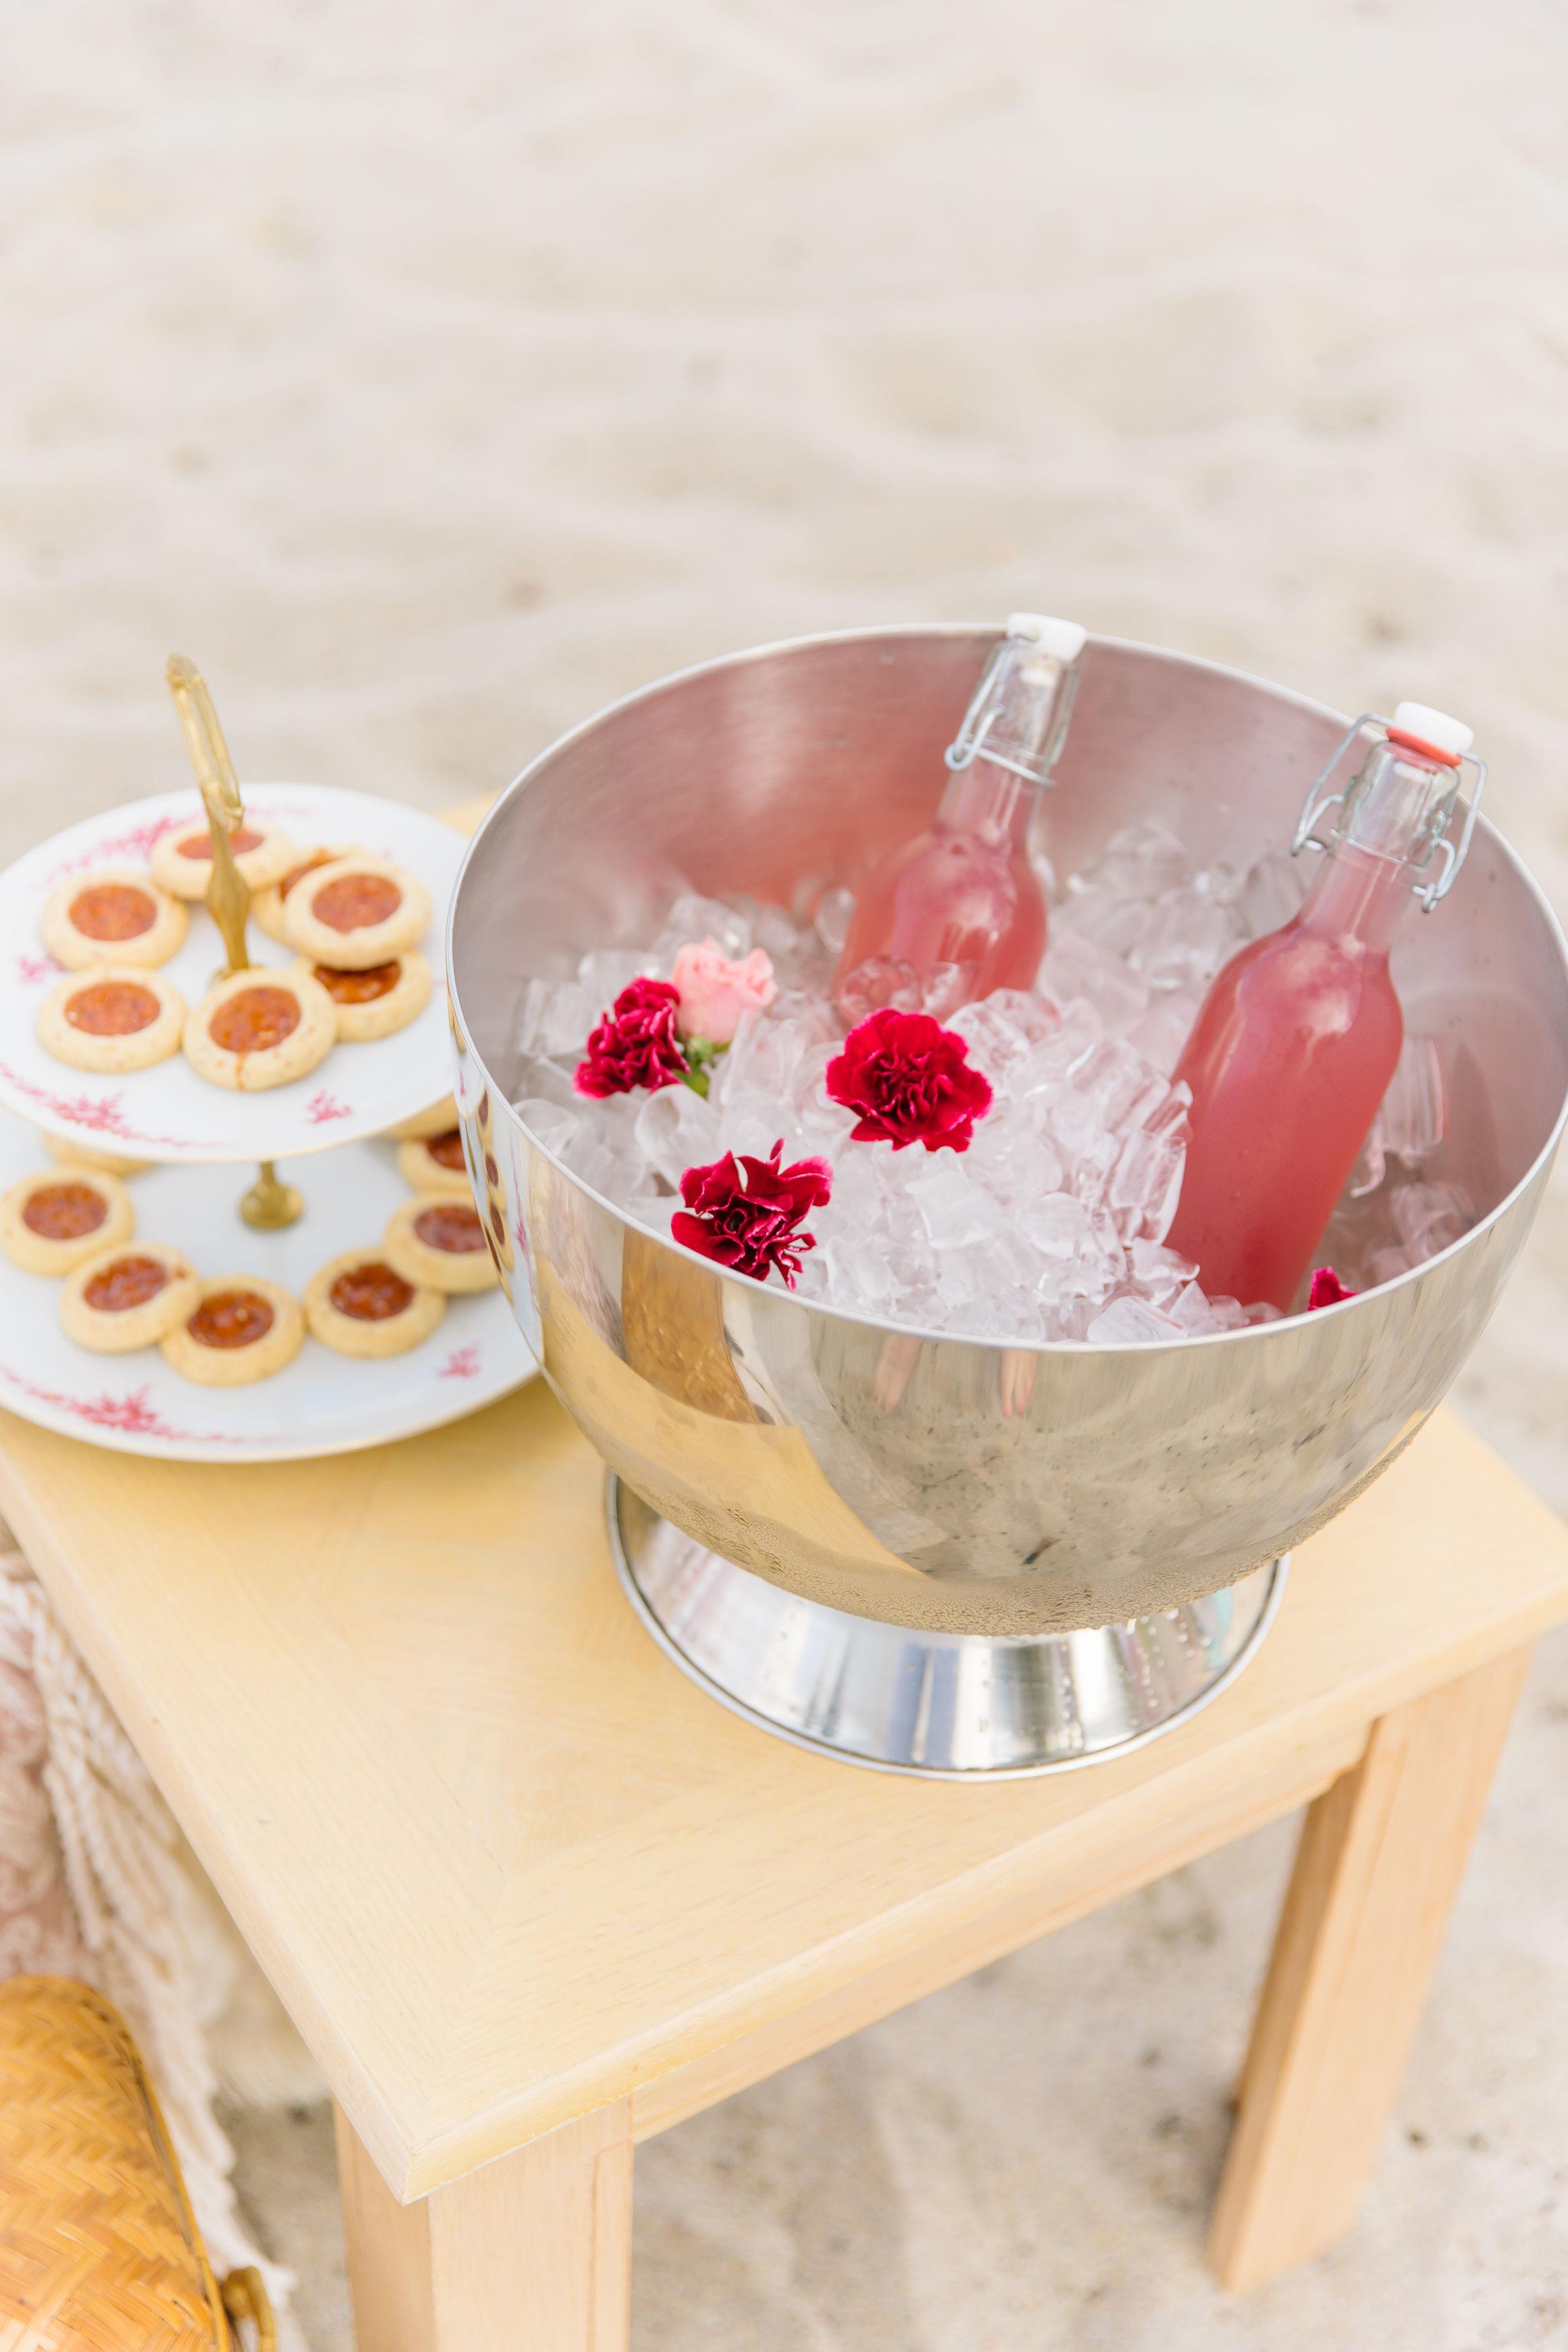 Palm Beach Lately Valentine's Day Beach Picnic